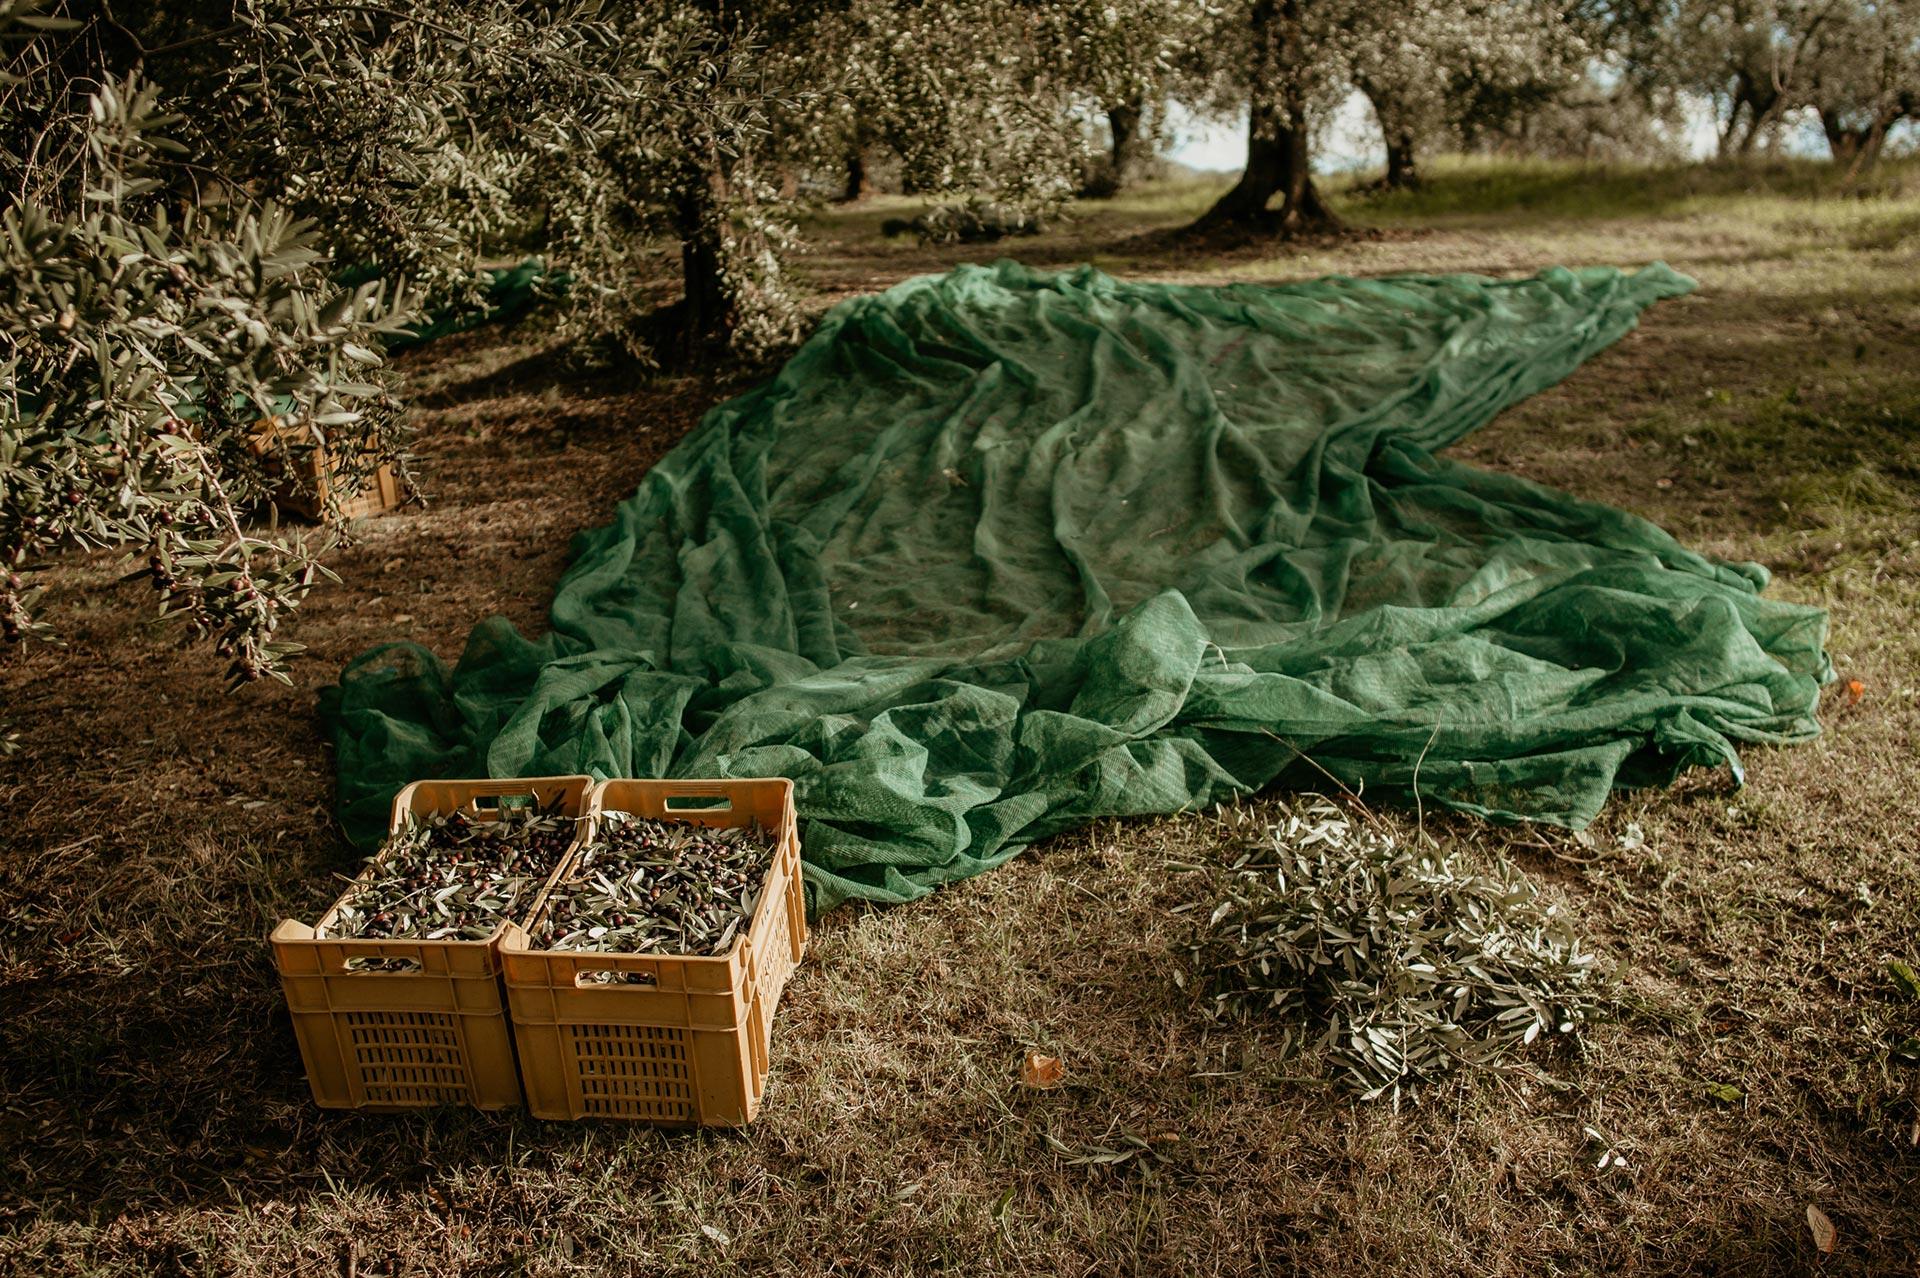 animado-film-produzioni-audiovisive-moricone-olives-03